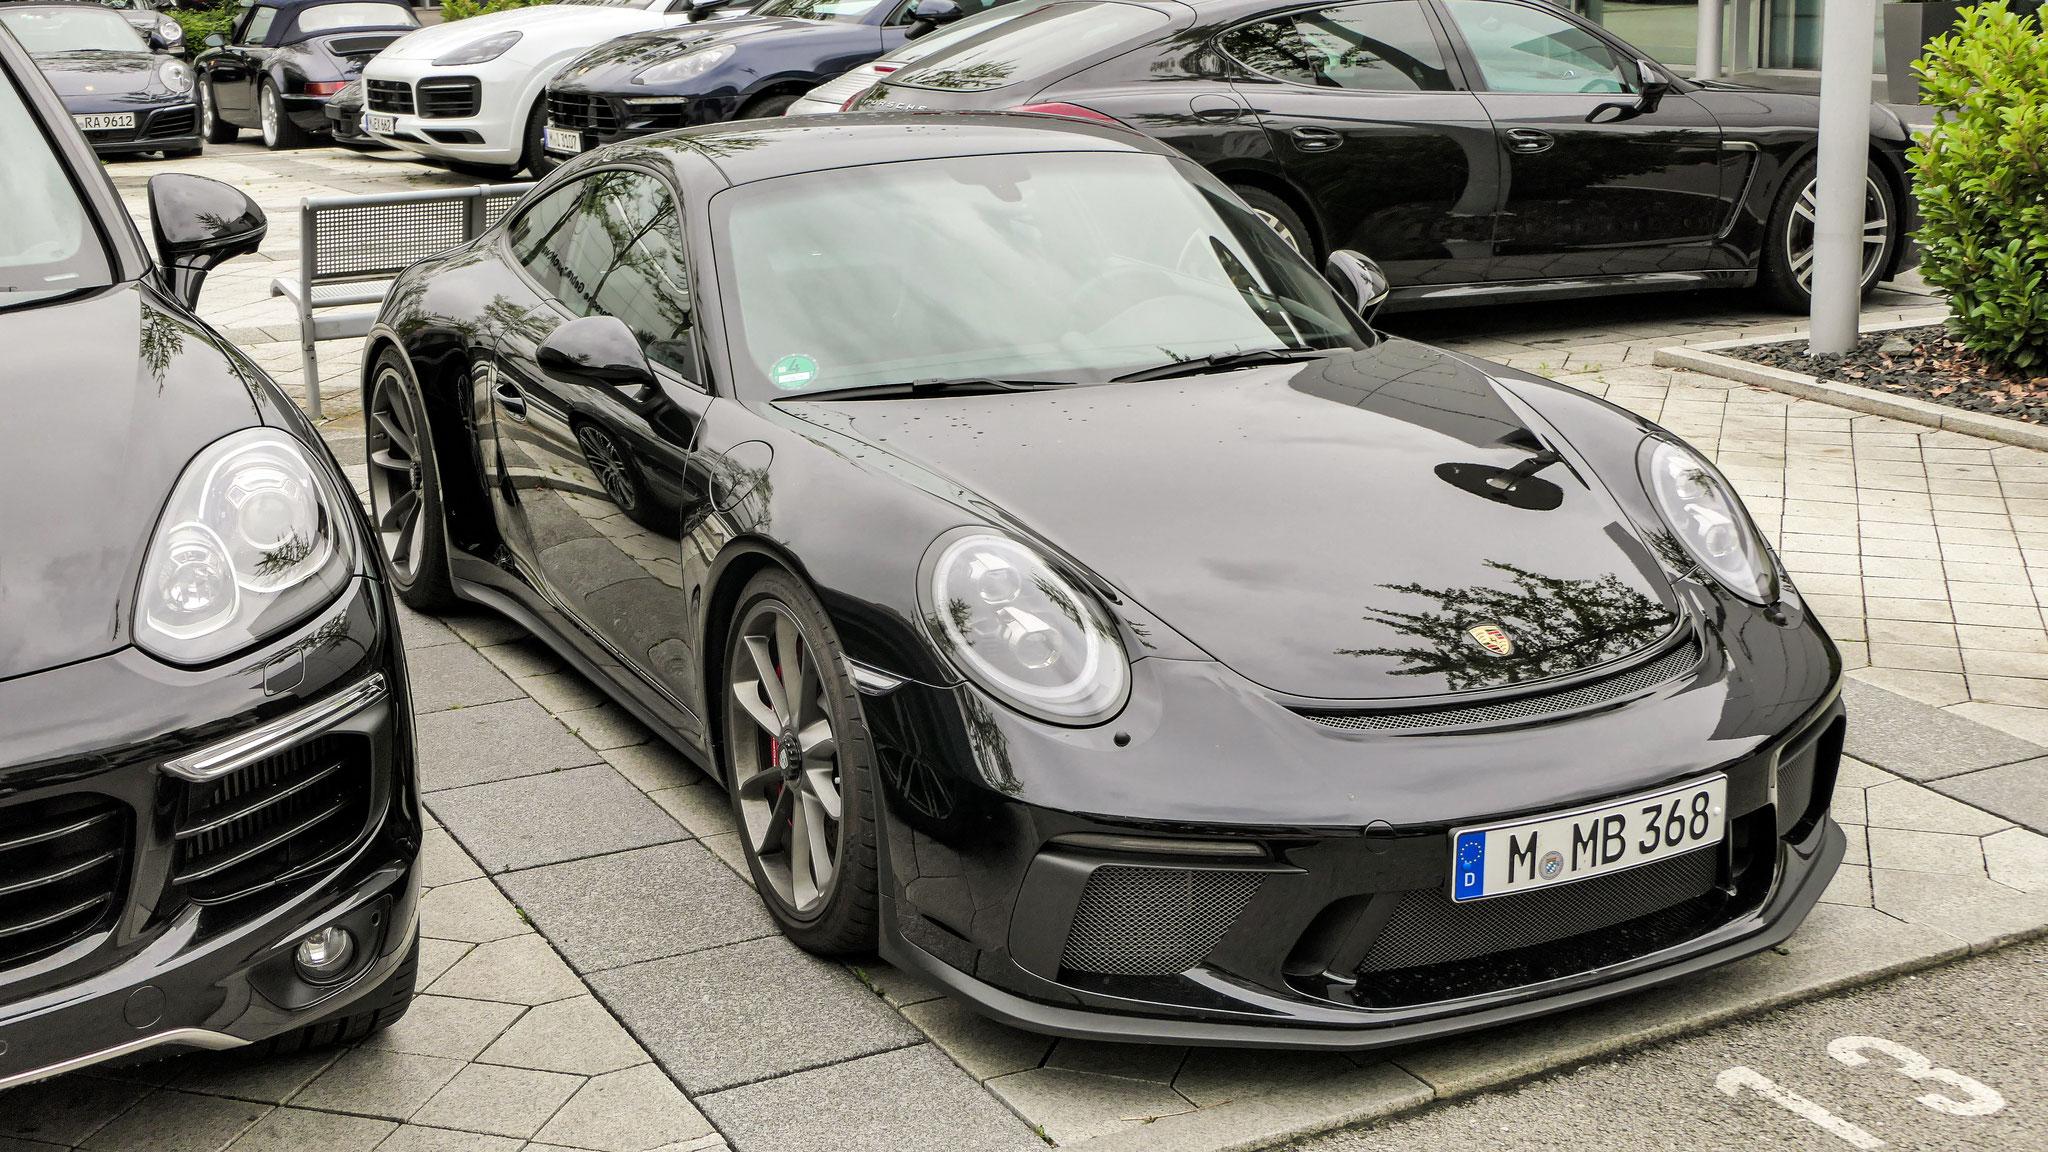 Porsche 991 GT3 Touring Package - M-MB-368